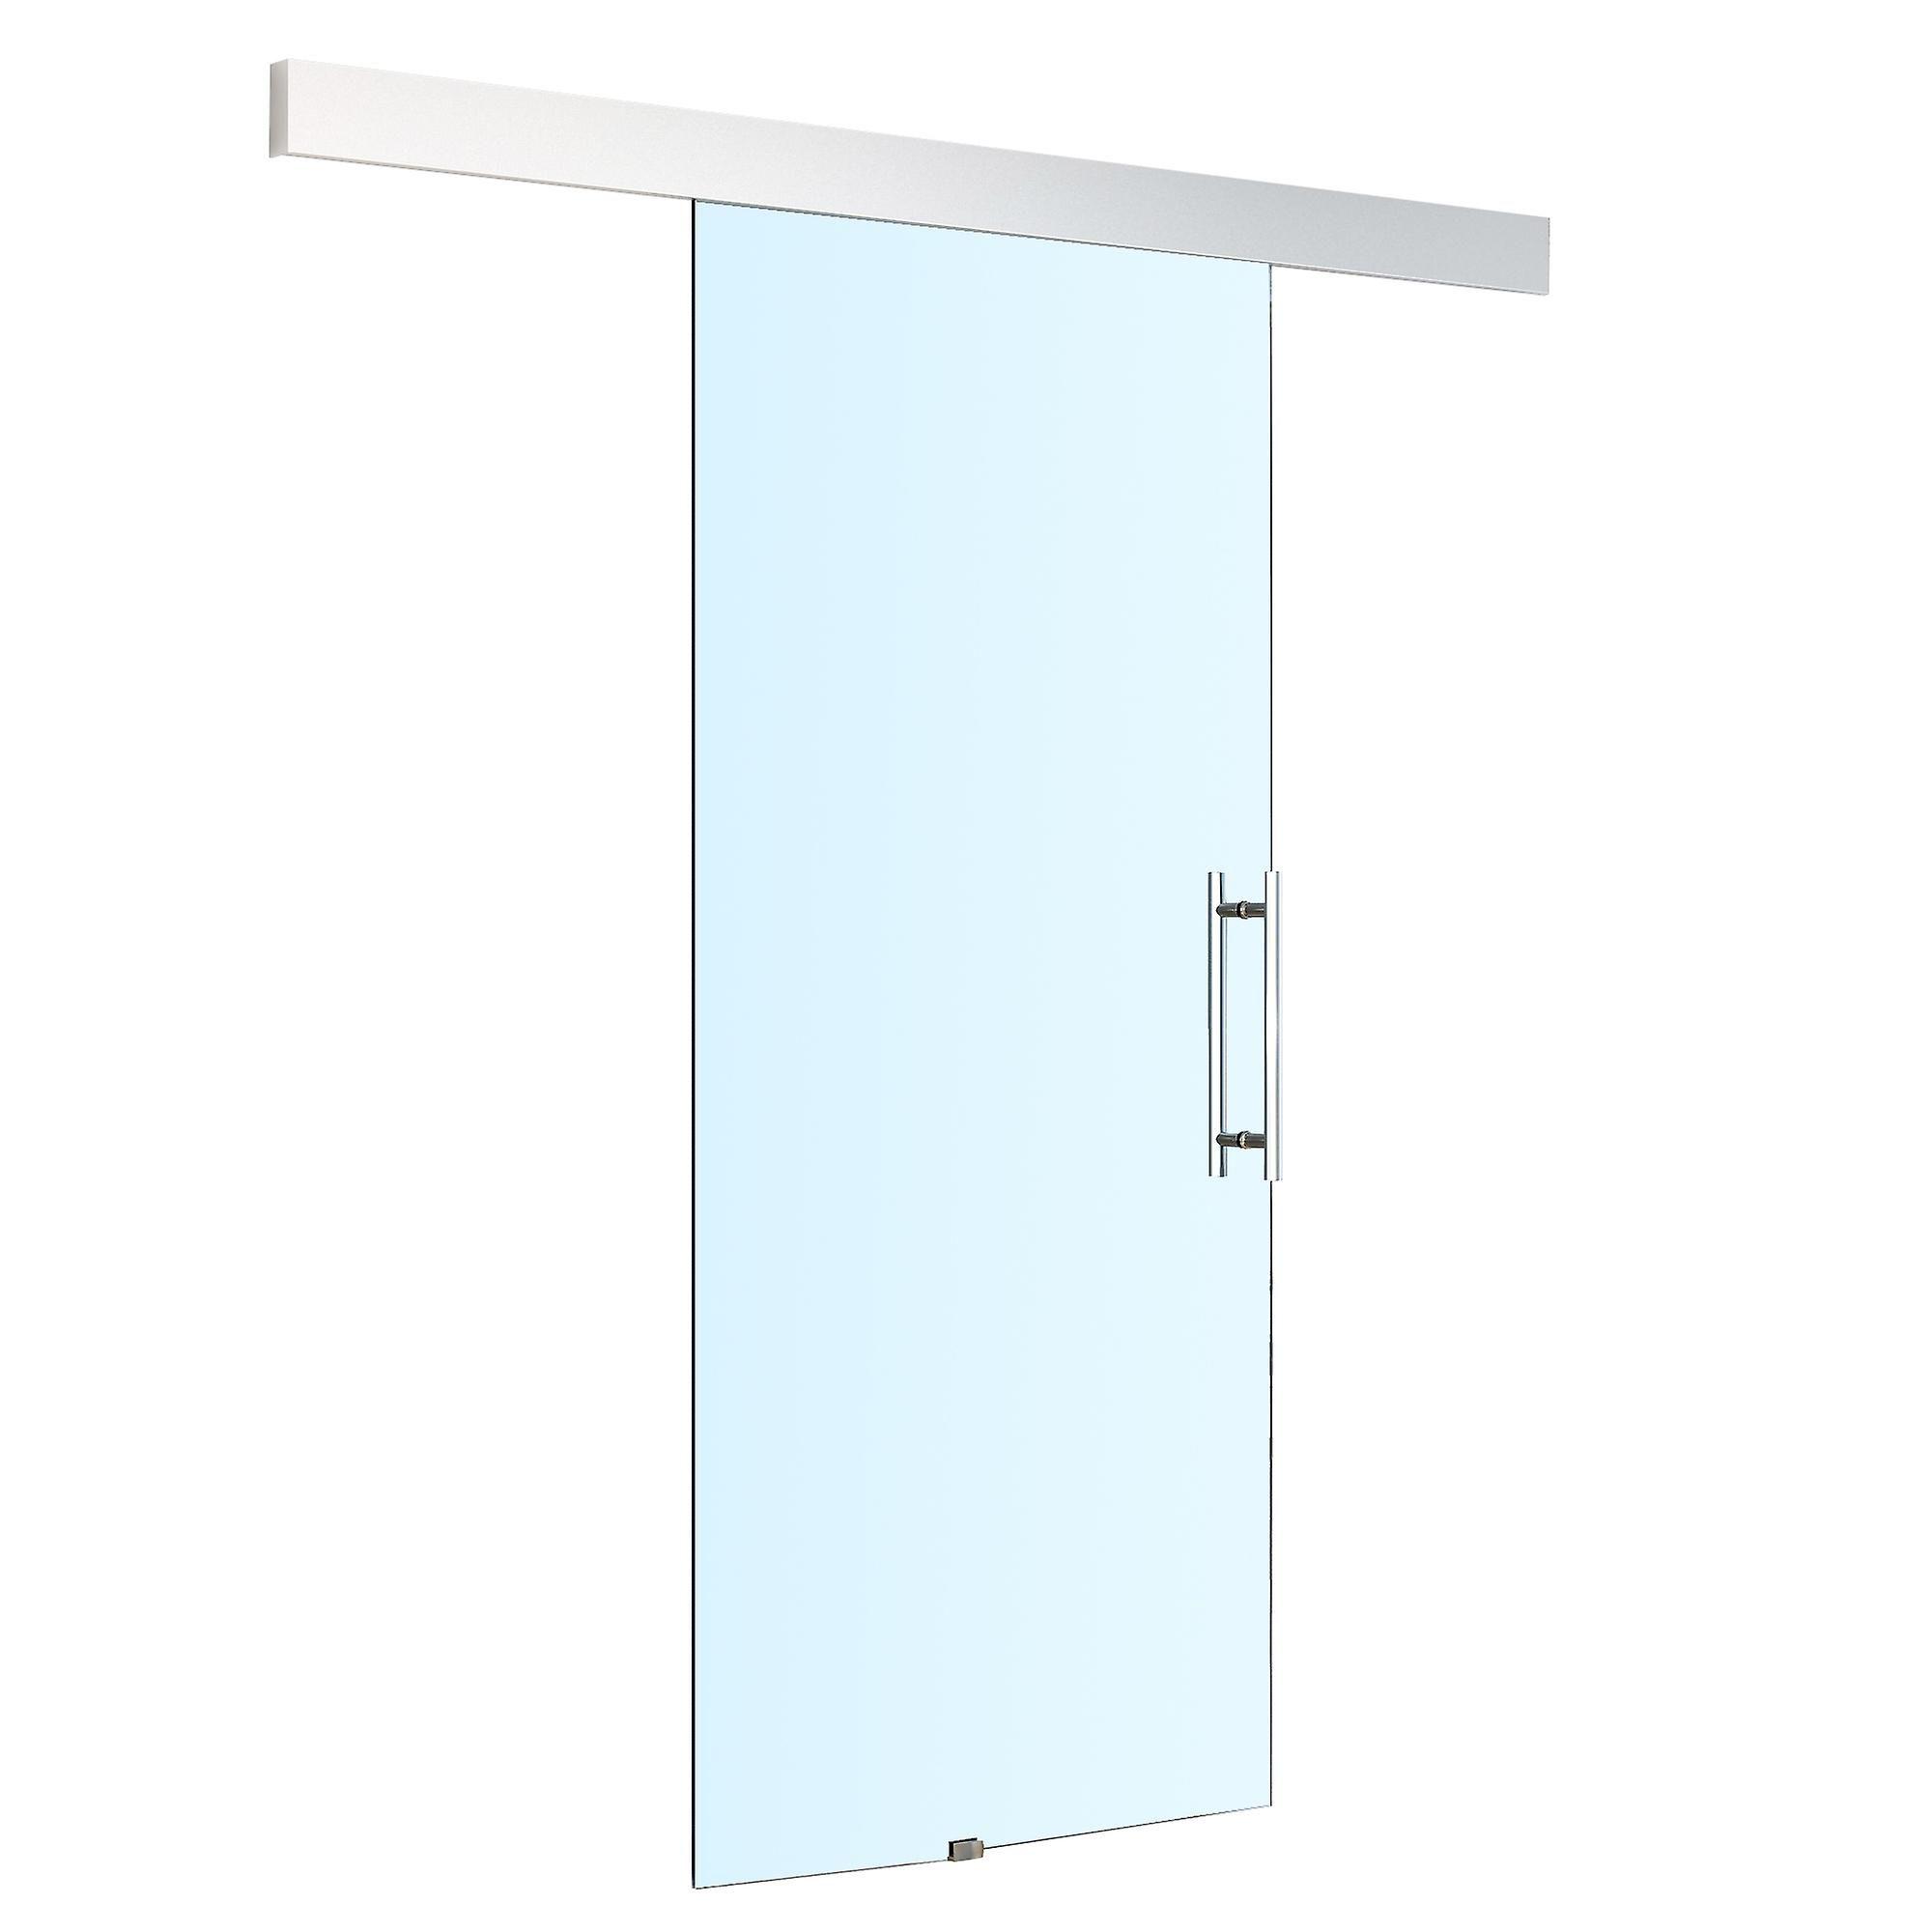 Homcom Sliding Glass Door 8mm Tempered Hardware Track Kit Interior System Handle 750 X 2100mm Fruugo With Images Sliding Glass Door Glass Door